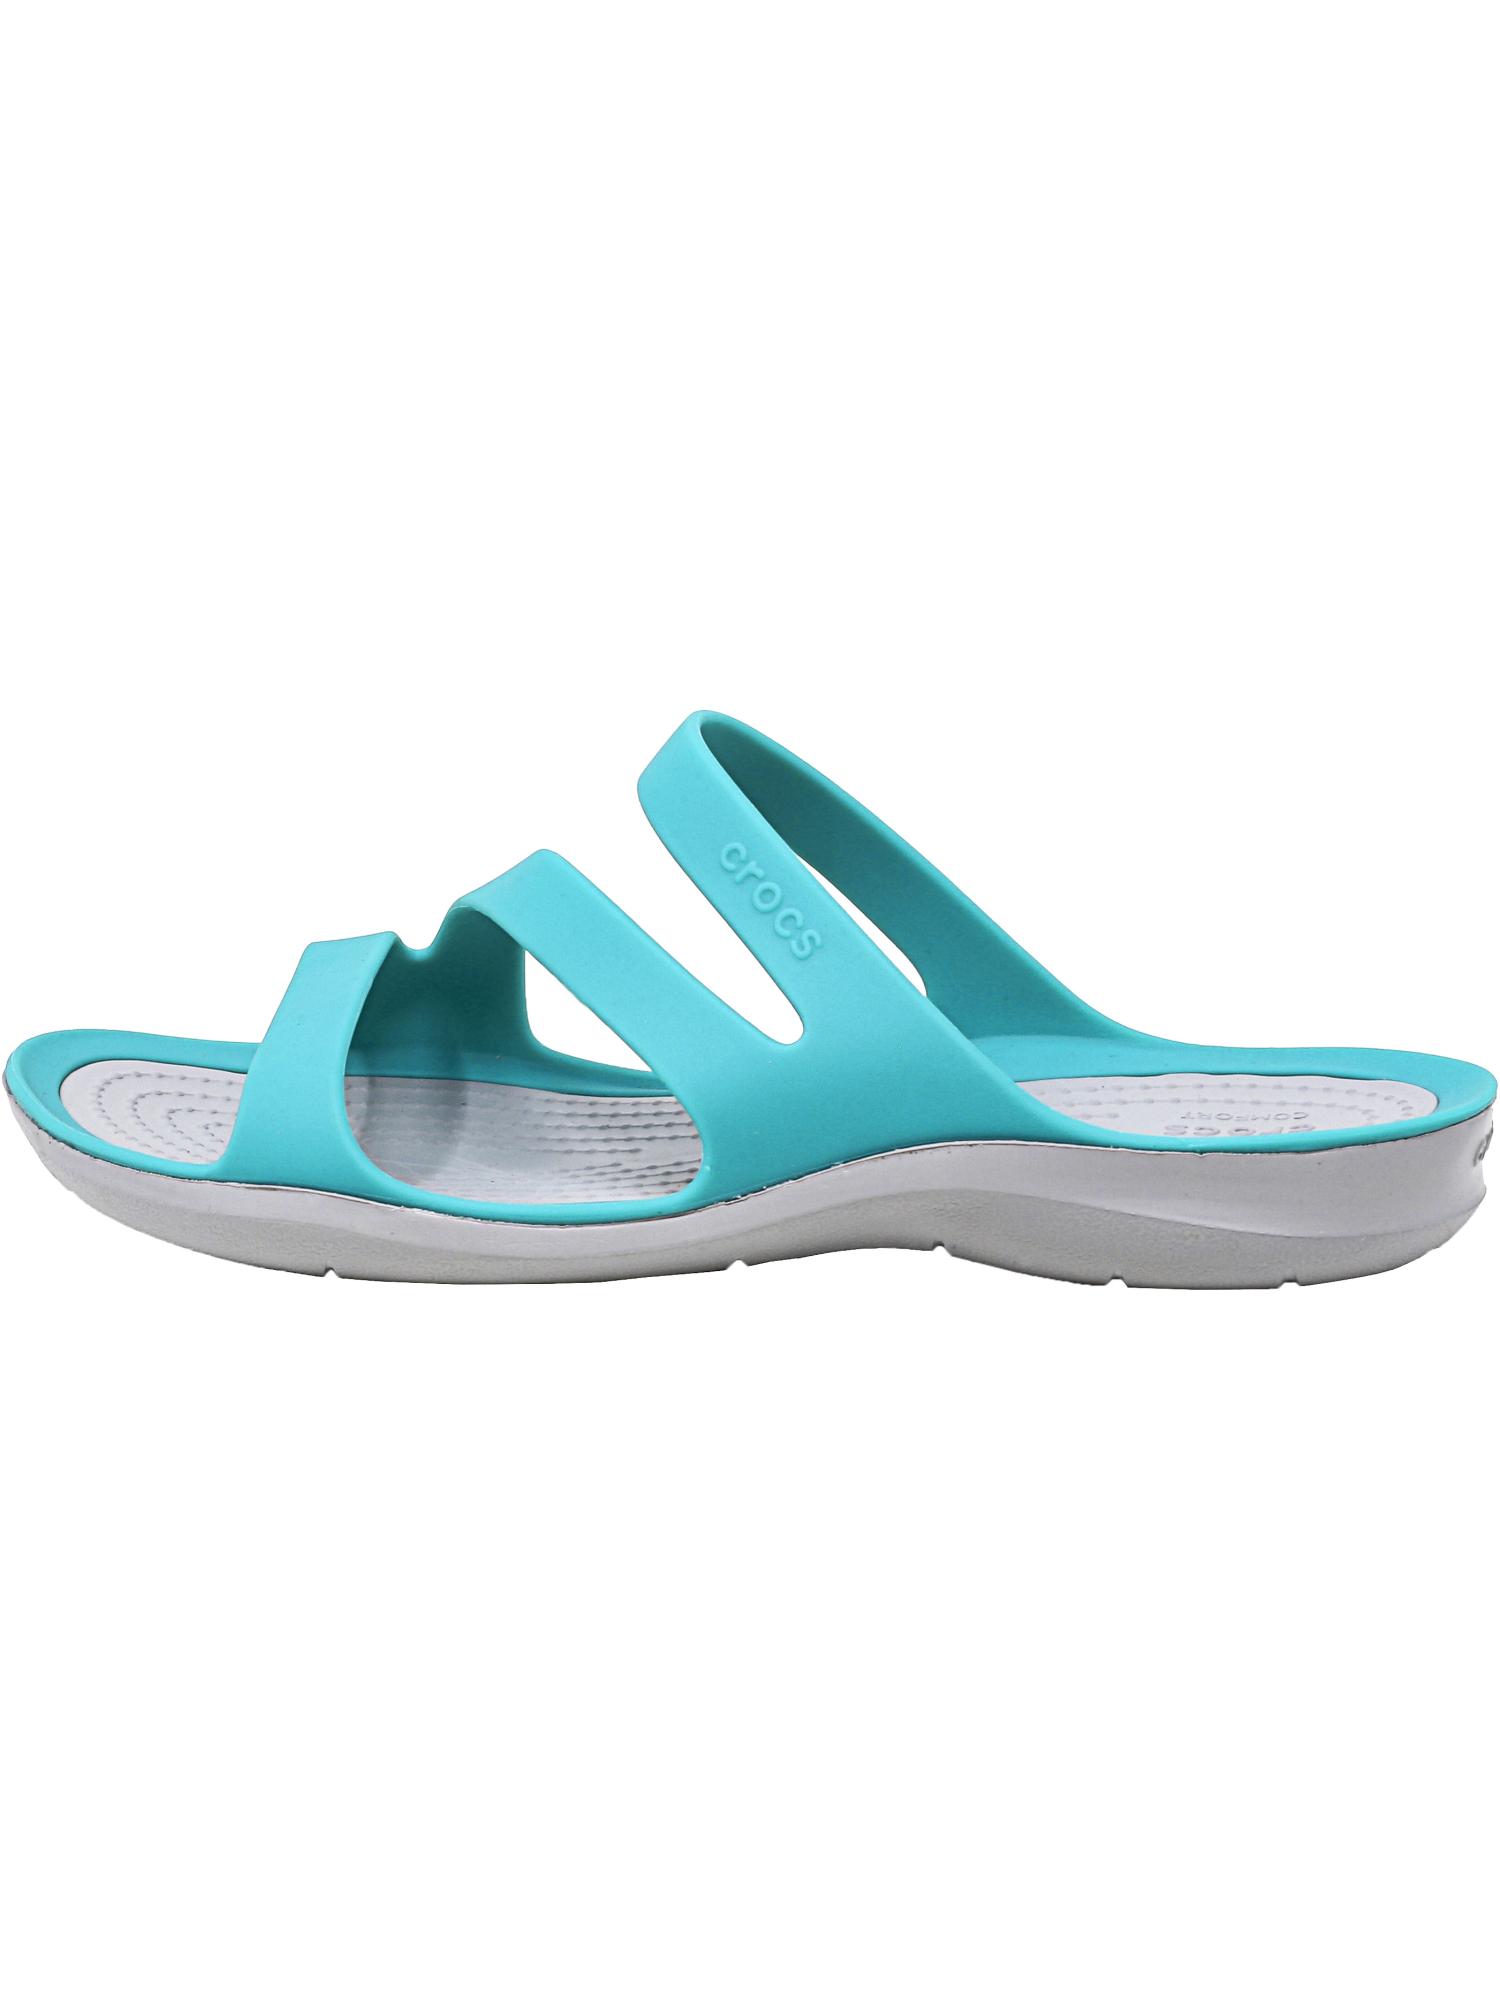 859201ab6de Crocs-Women-039-s-Swiftwater-Sandal